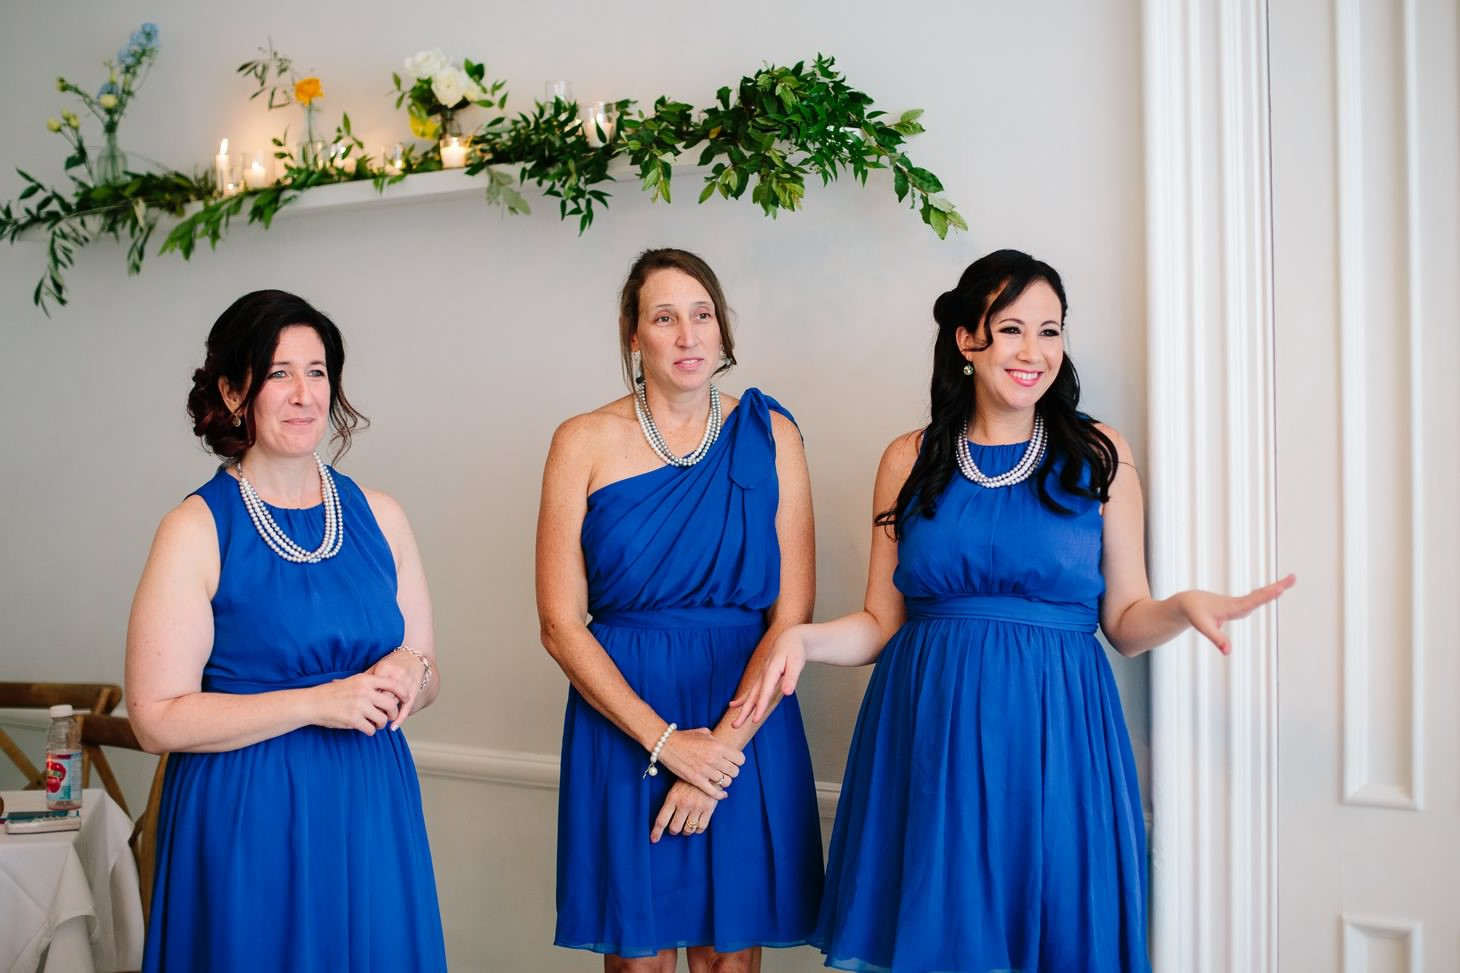 006-nyc-wedding-photographer-brooklyn-restaurant-2.jpg